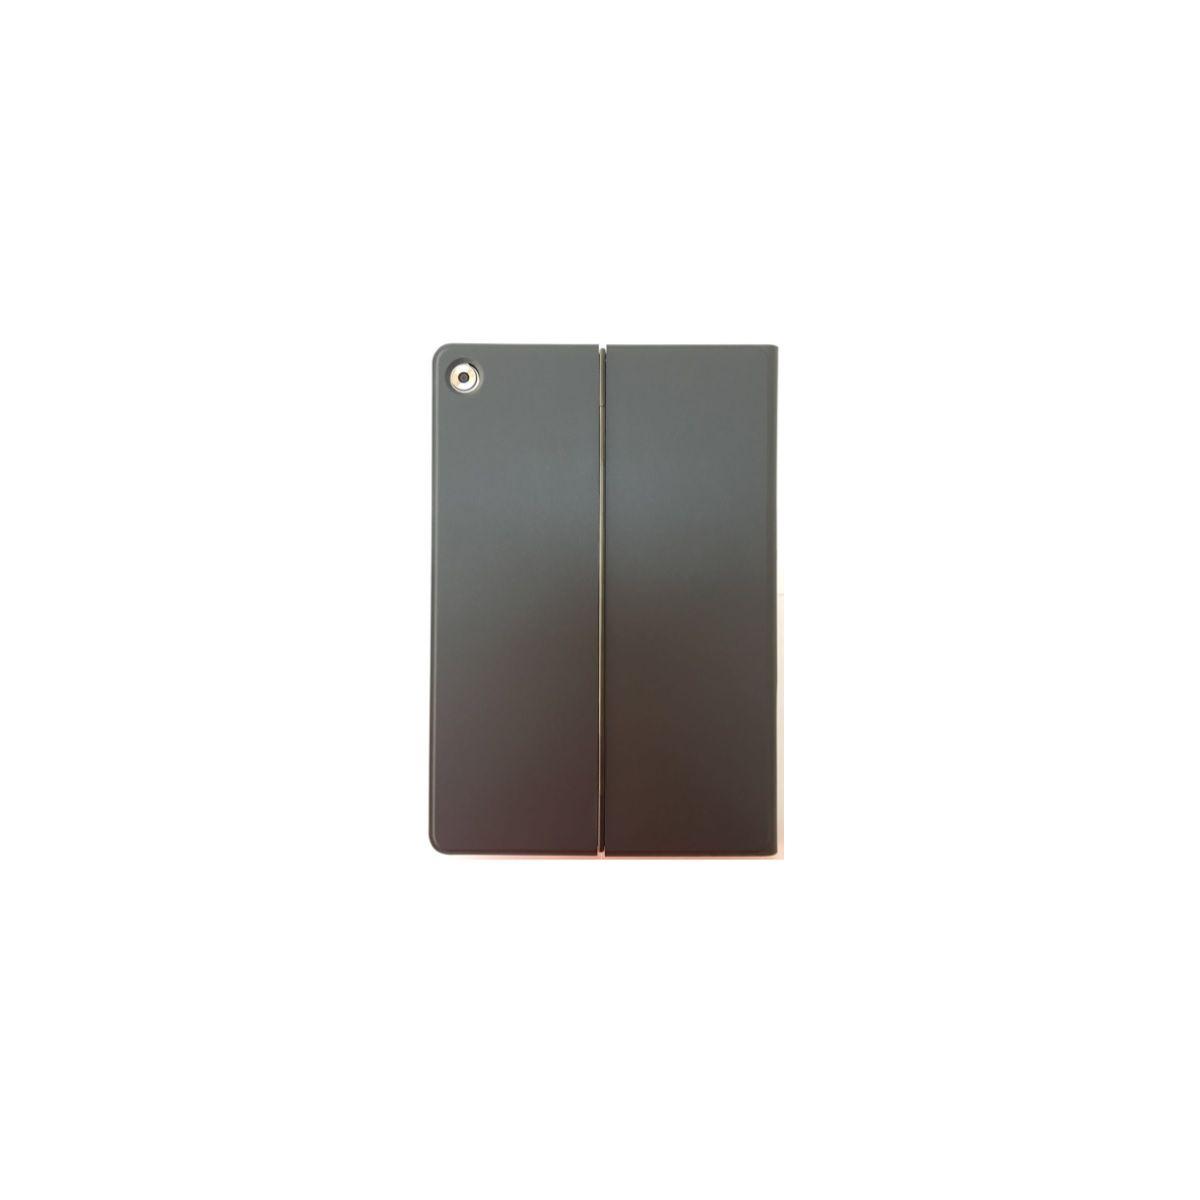 Clavier sans fil HUAWEI Keyboard cover pour Huawei M5